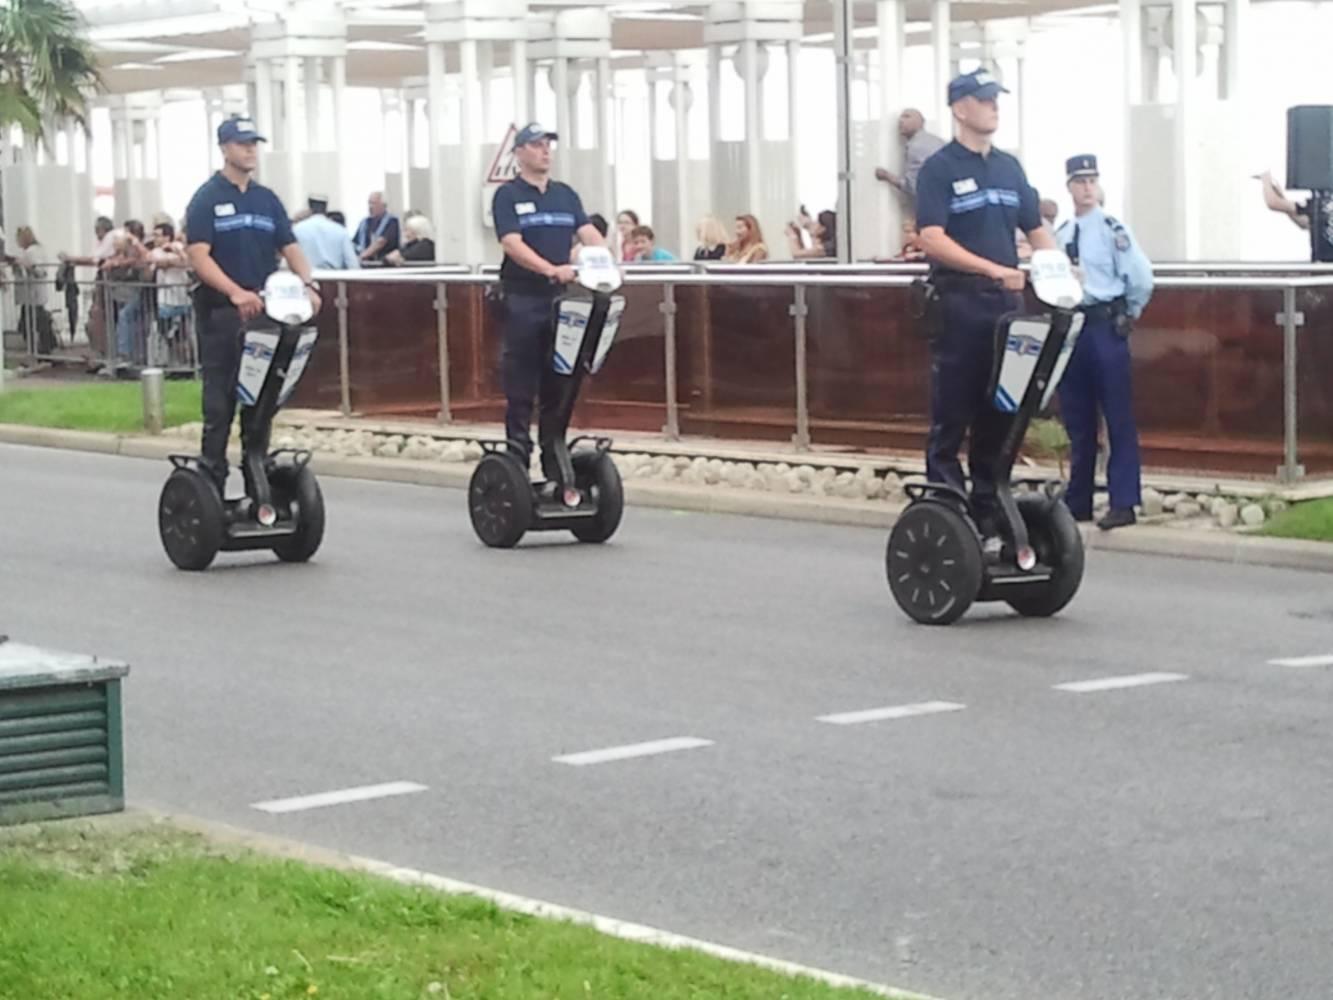 Police_Segway.jpg